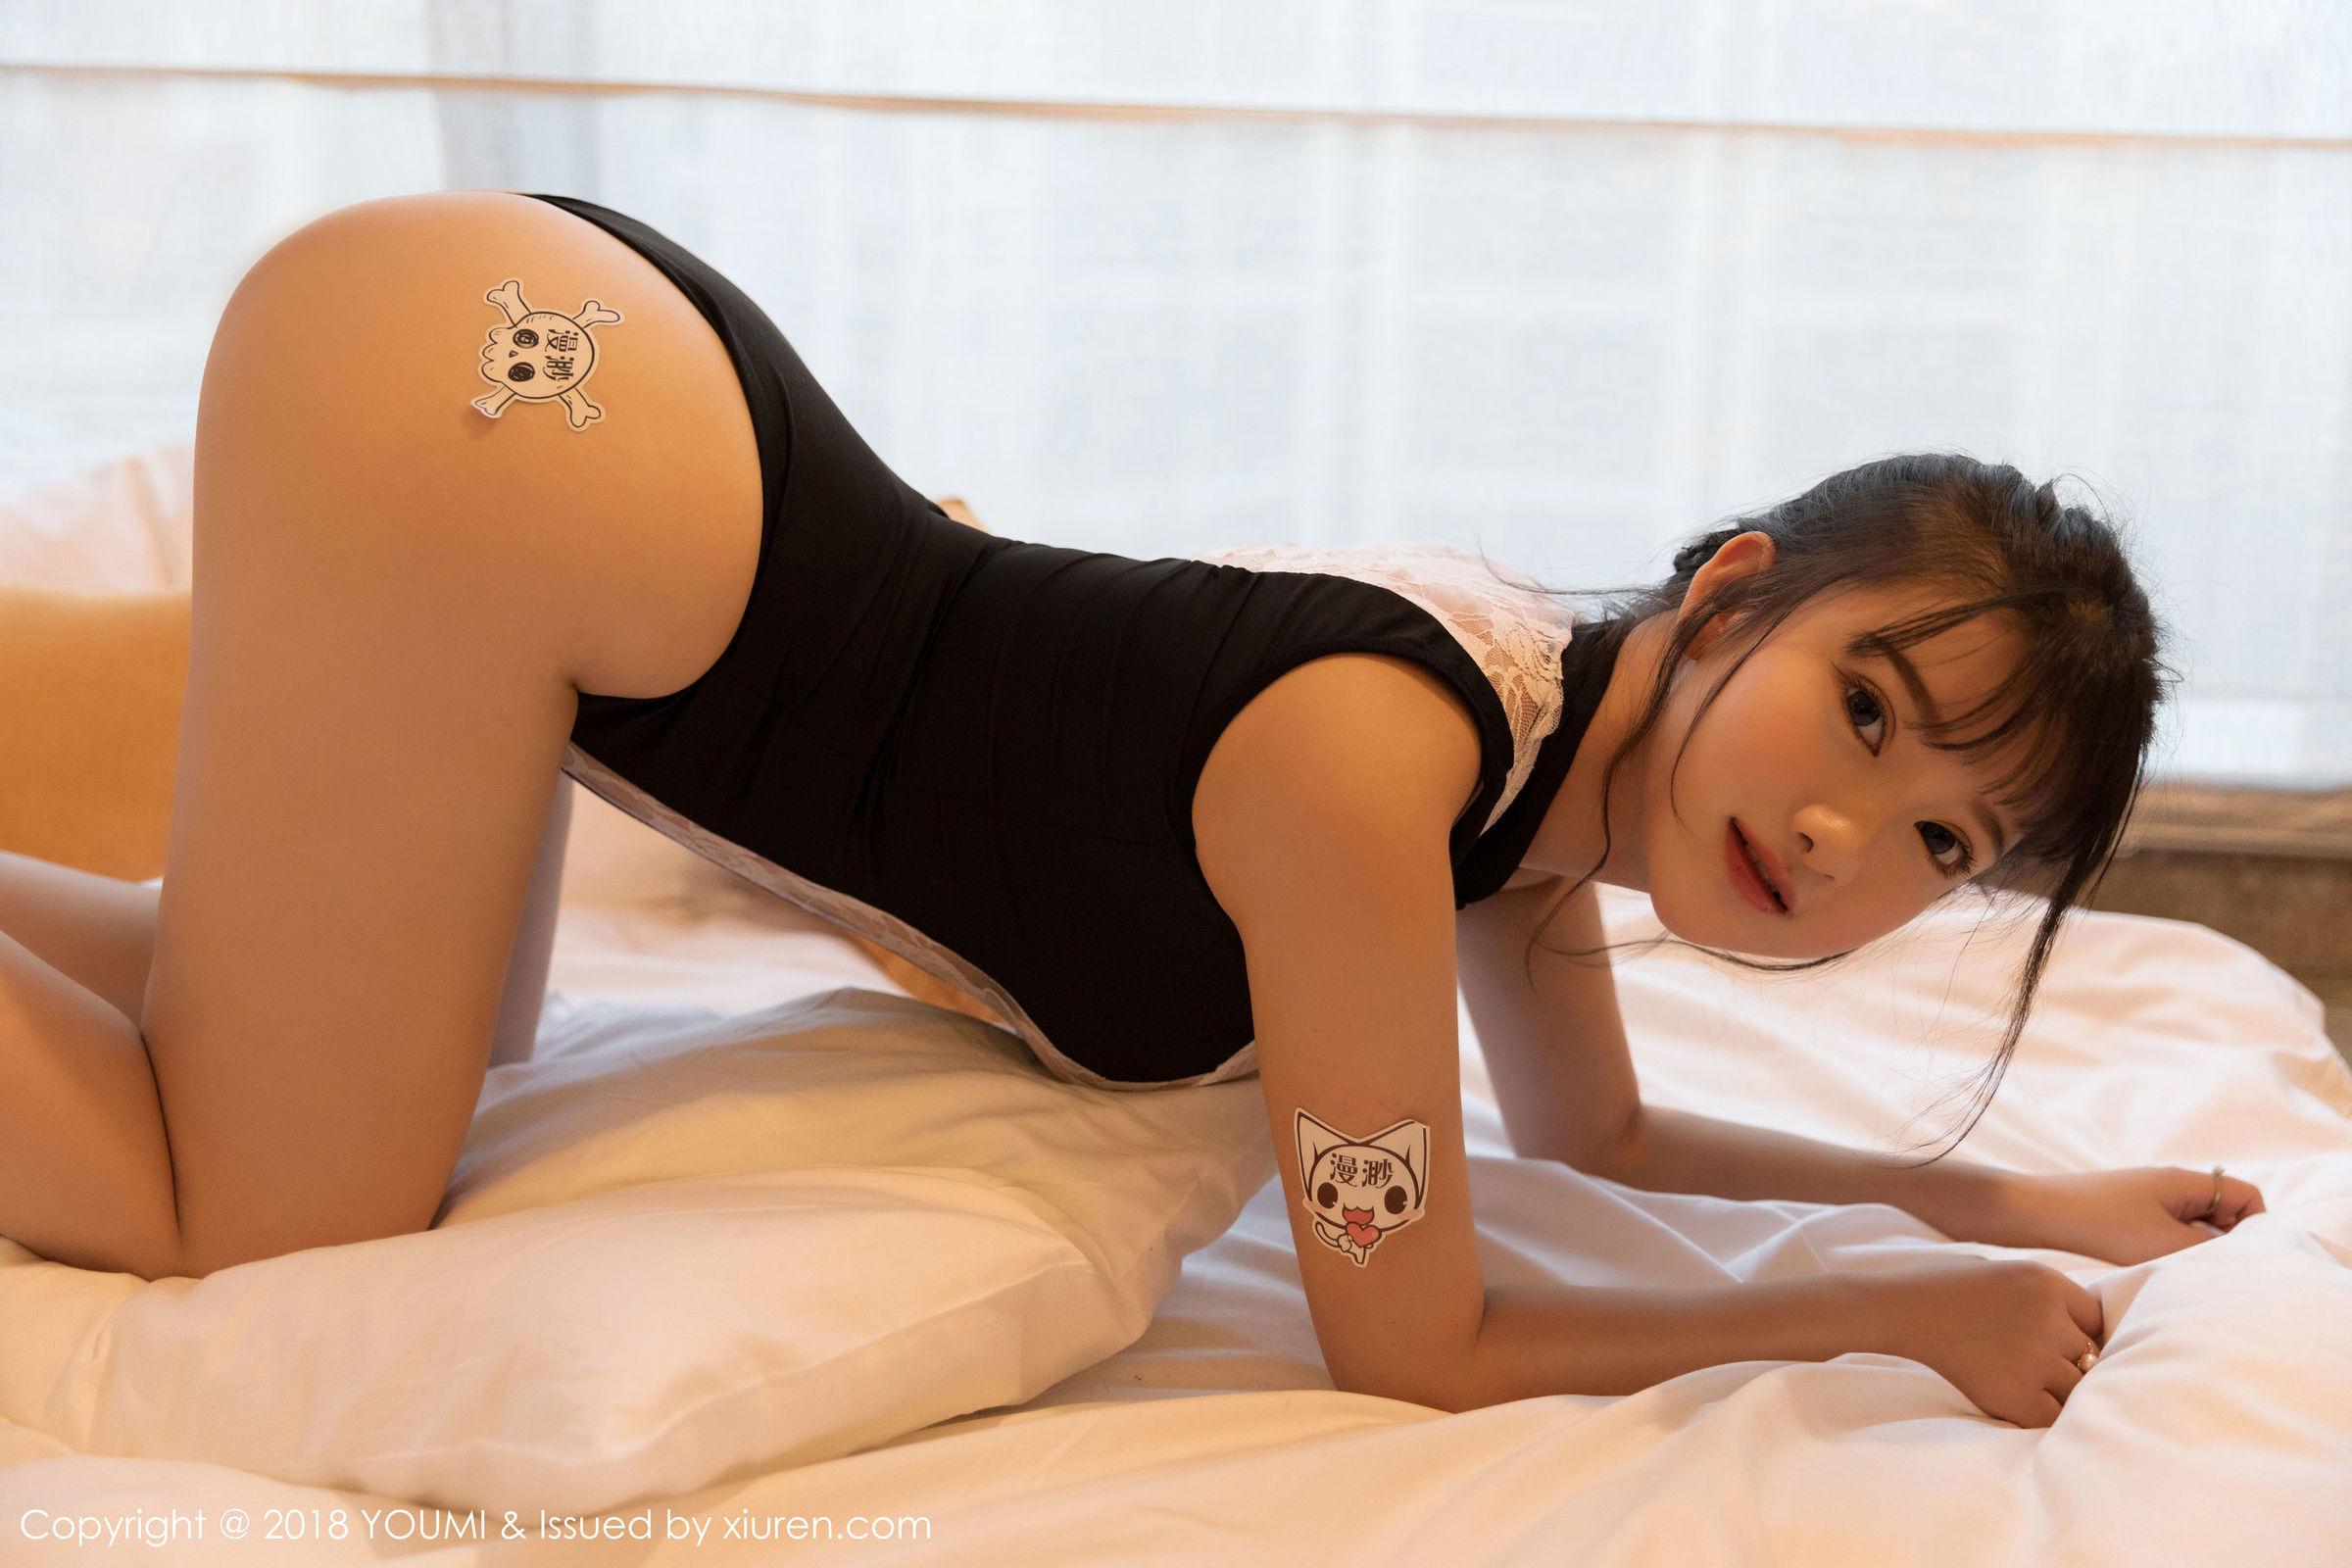 [YouMi尤蜜荟] Vol.250 童颜巨乳模特@小尤奈第二套丝袜美图[48P]